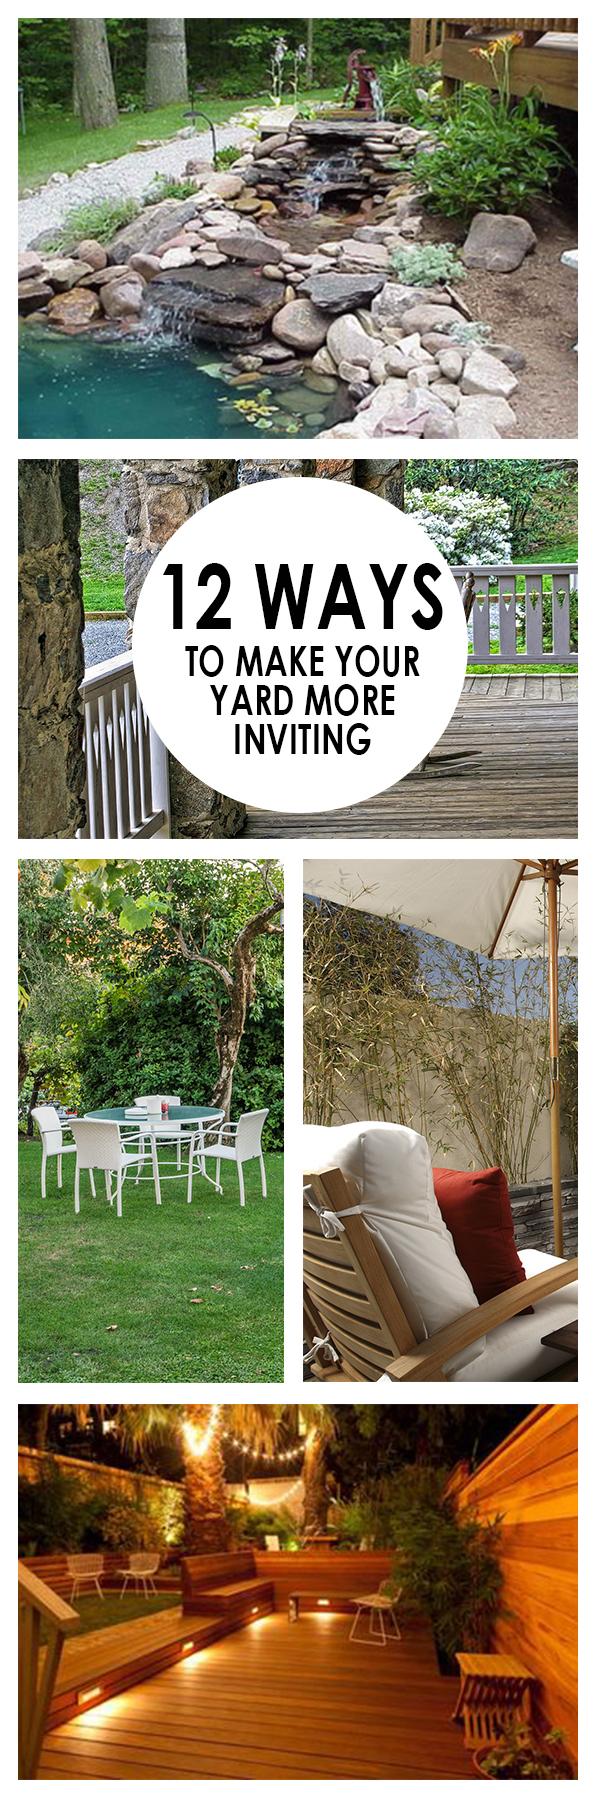 Yard and garden, yard updates, DIY yard updates, popular pin, yard ideas, landscaping ideas, yard decor.